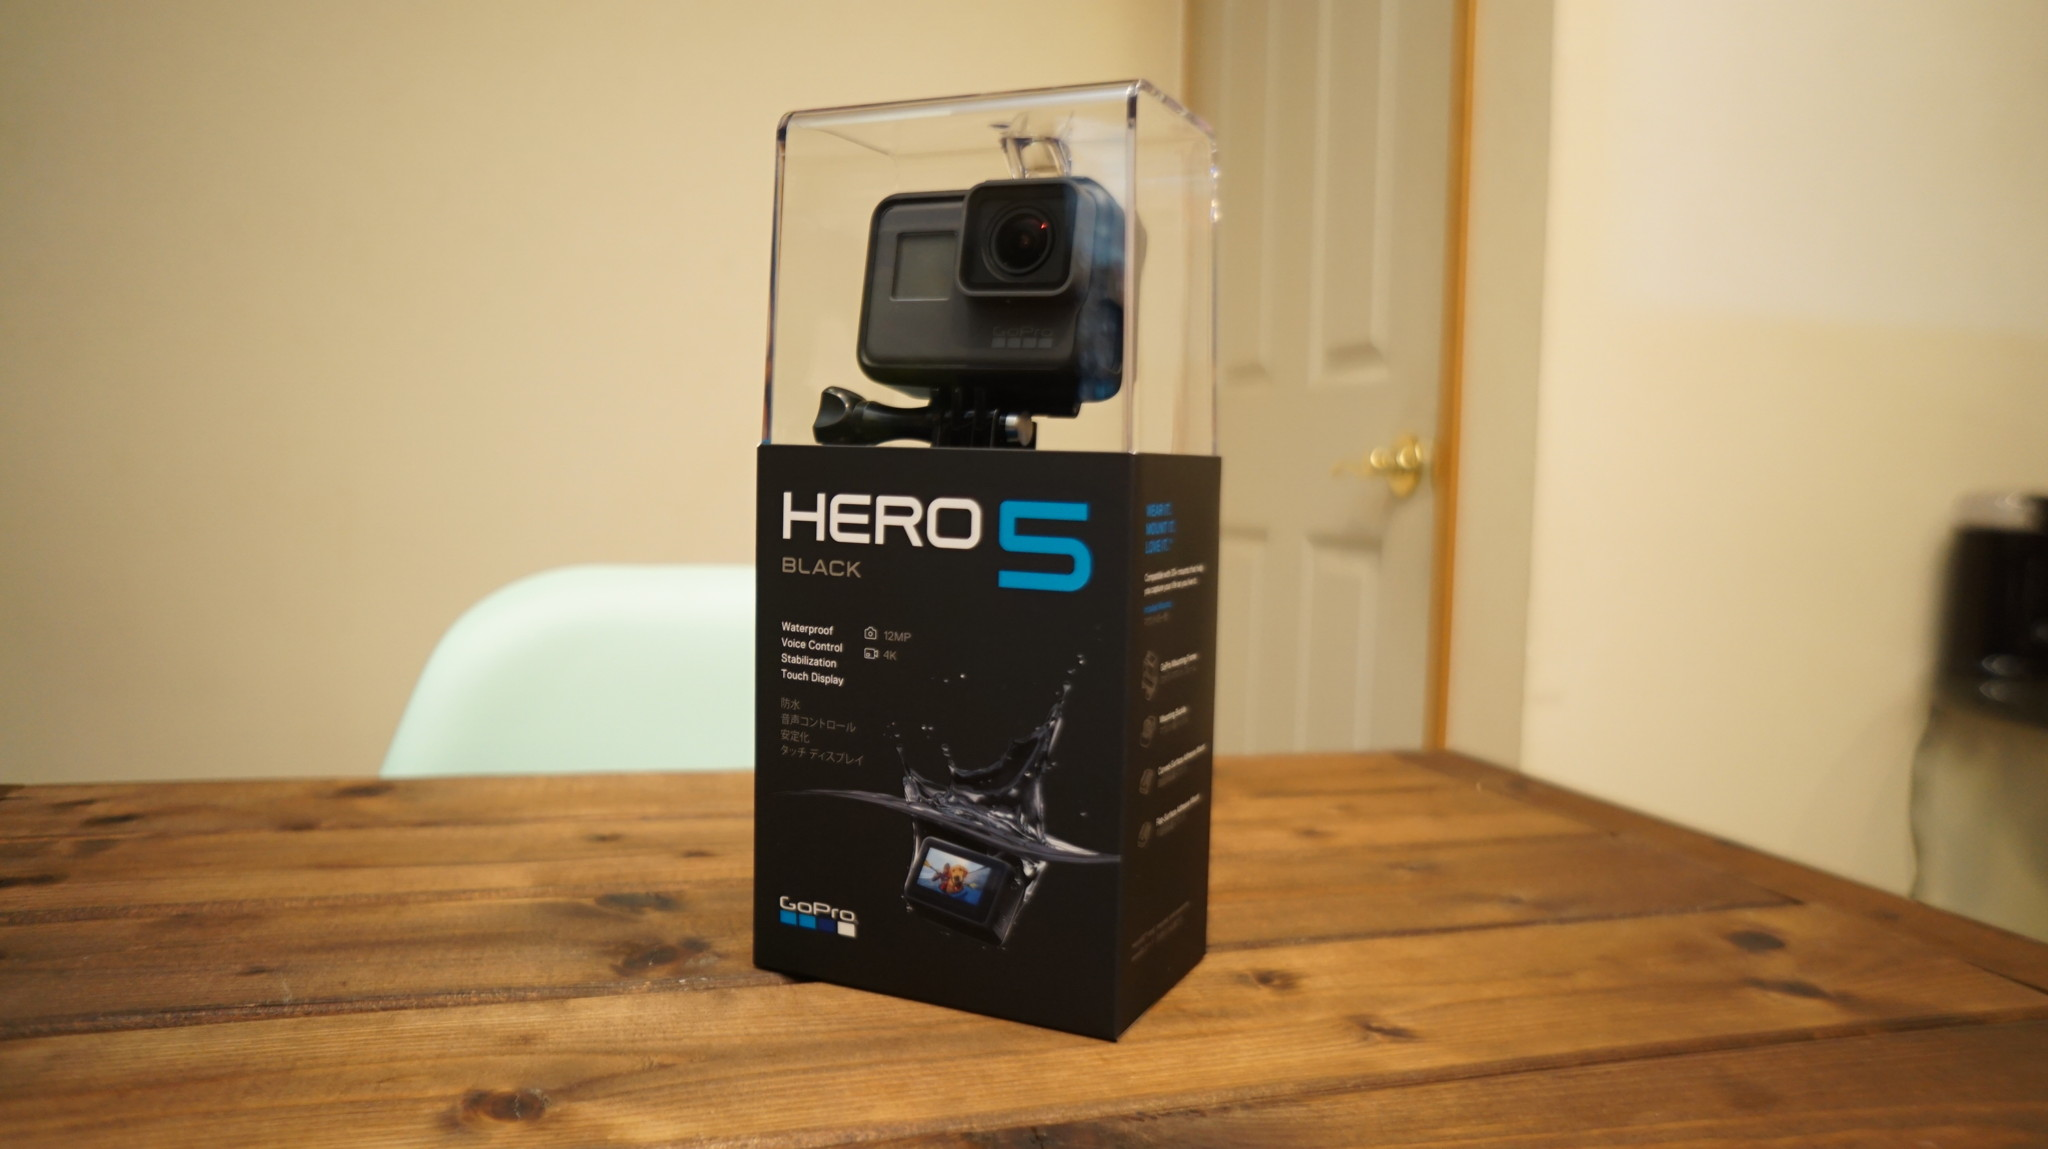 GoPro HERO5 BLACKがやってきた 開封編